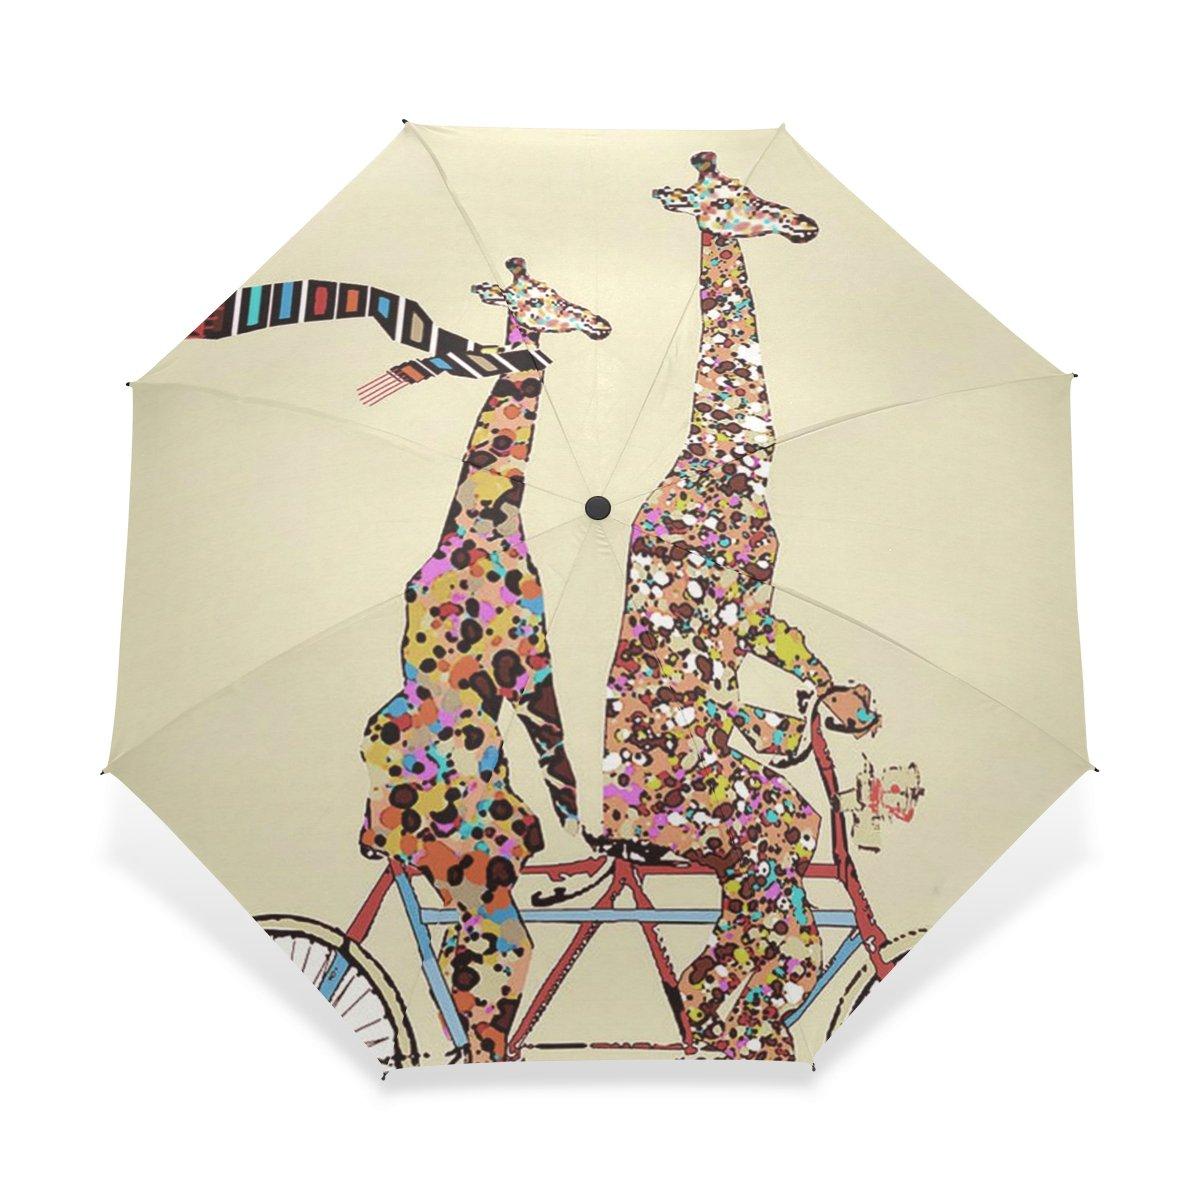 baihuishop防風強力なフレームUnbreakableキリンパターンゴルフ傘、コンパクトで旅行for Easy Carryingスポーツ雨傘 B01I2NEM0K